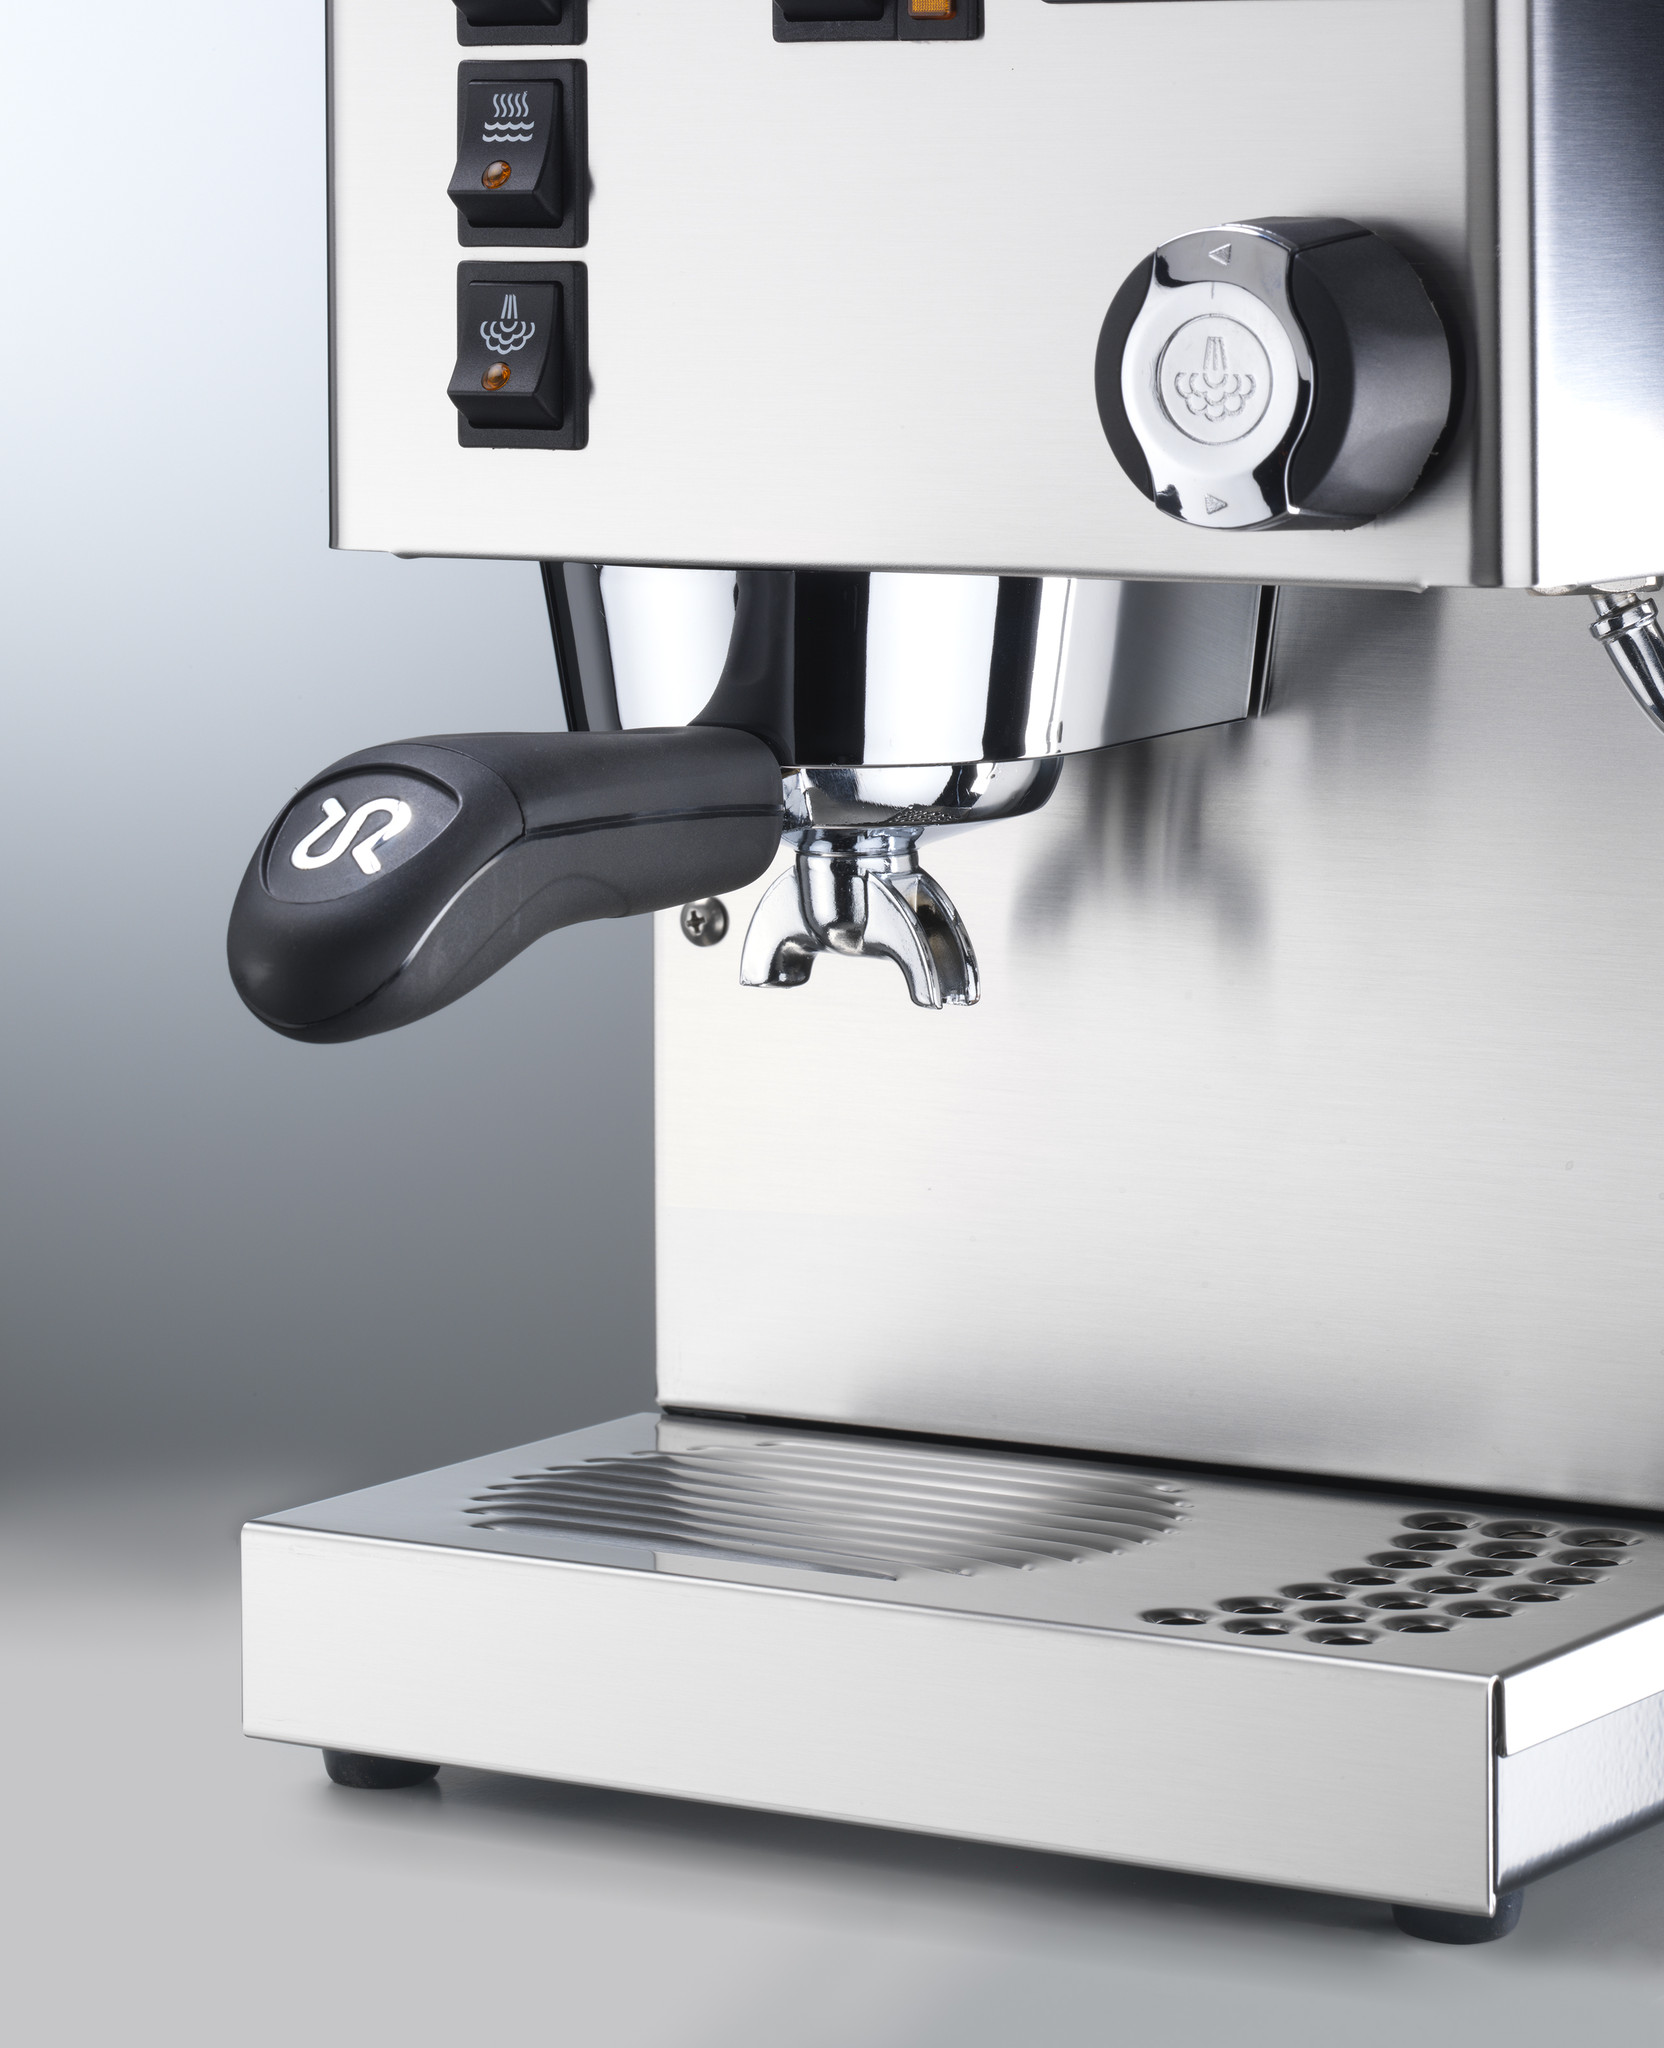 Electronic Rancilio Coffee Machine For Sale rancilio silvia v5 latest model on sale